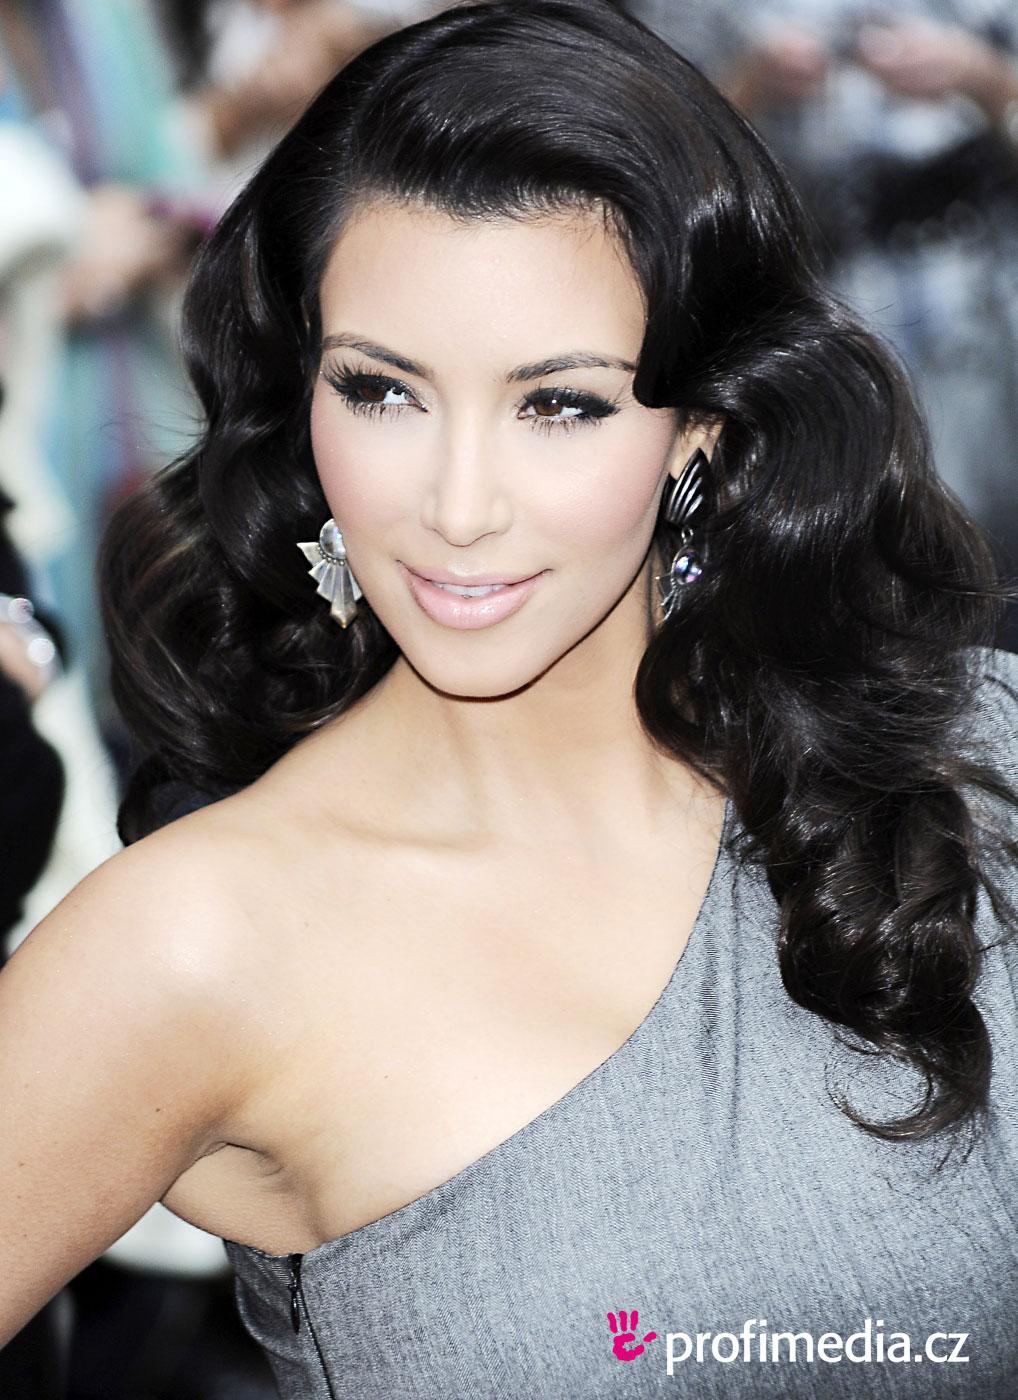 Celebrity Hairstyles: Kim Kardashian Hairstyles recommend